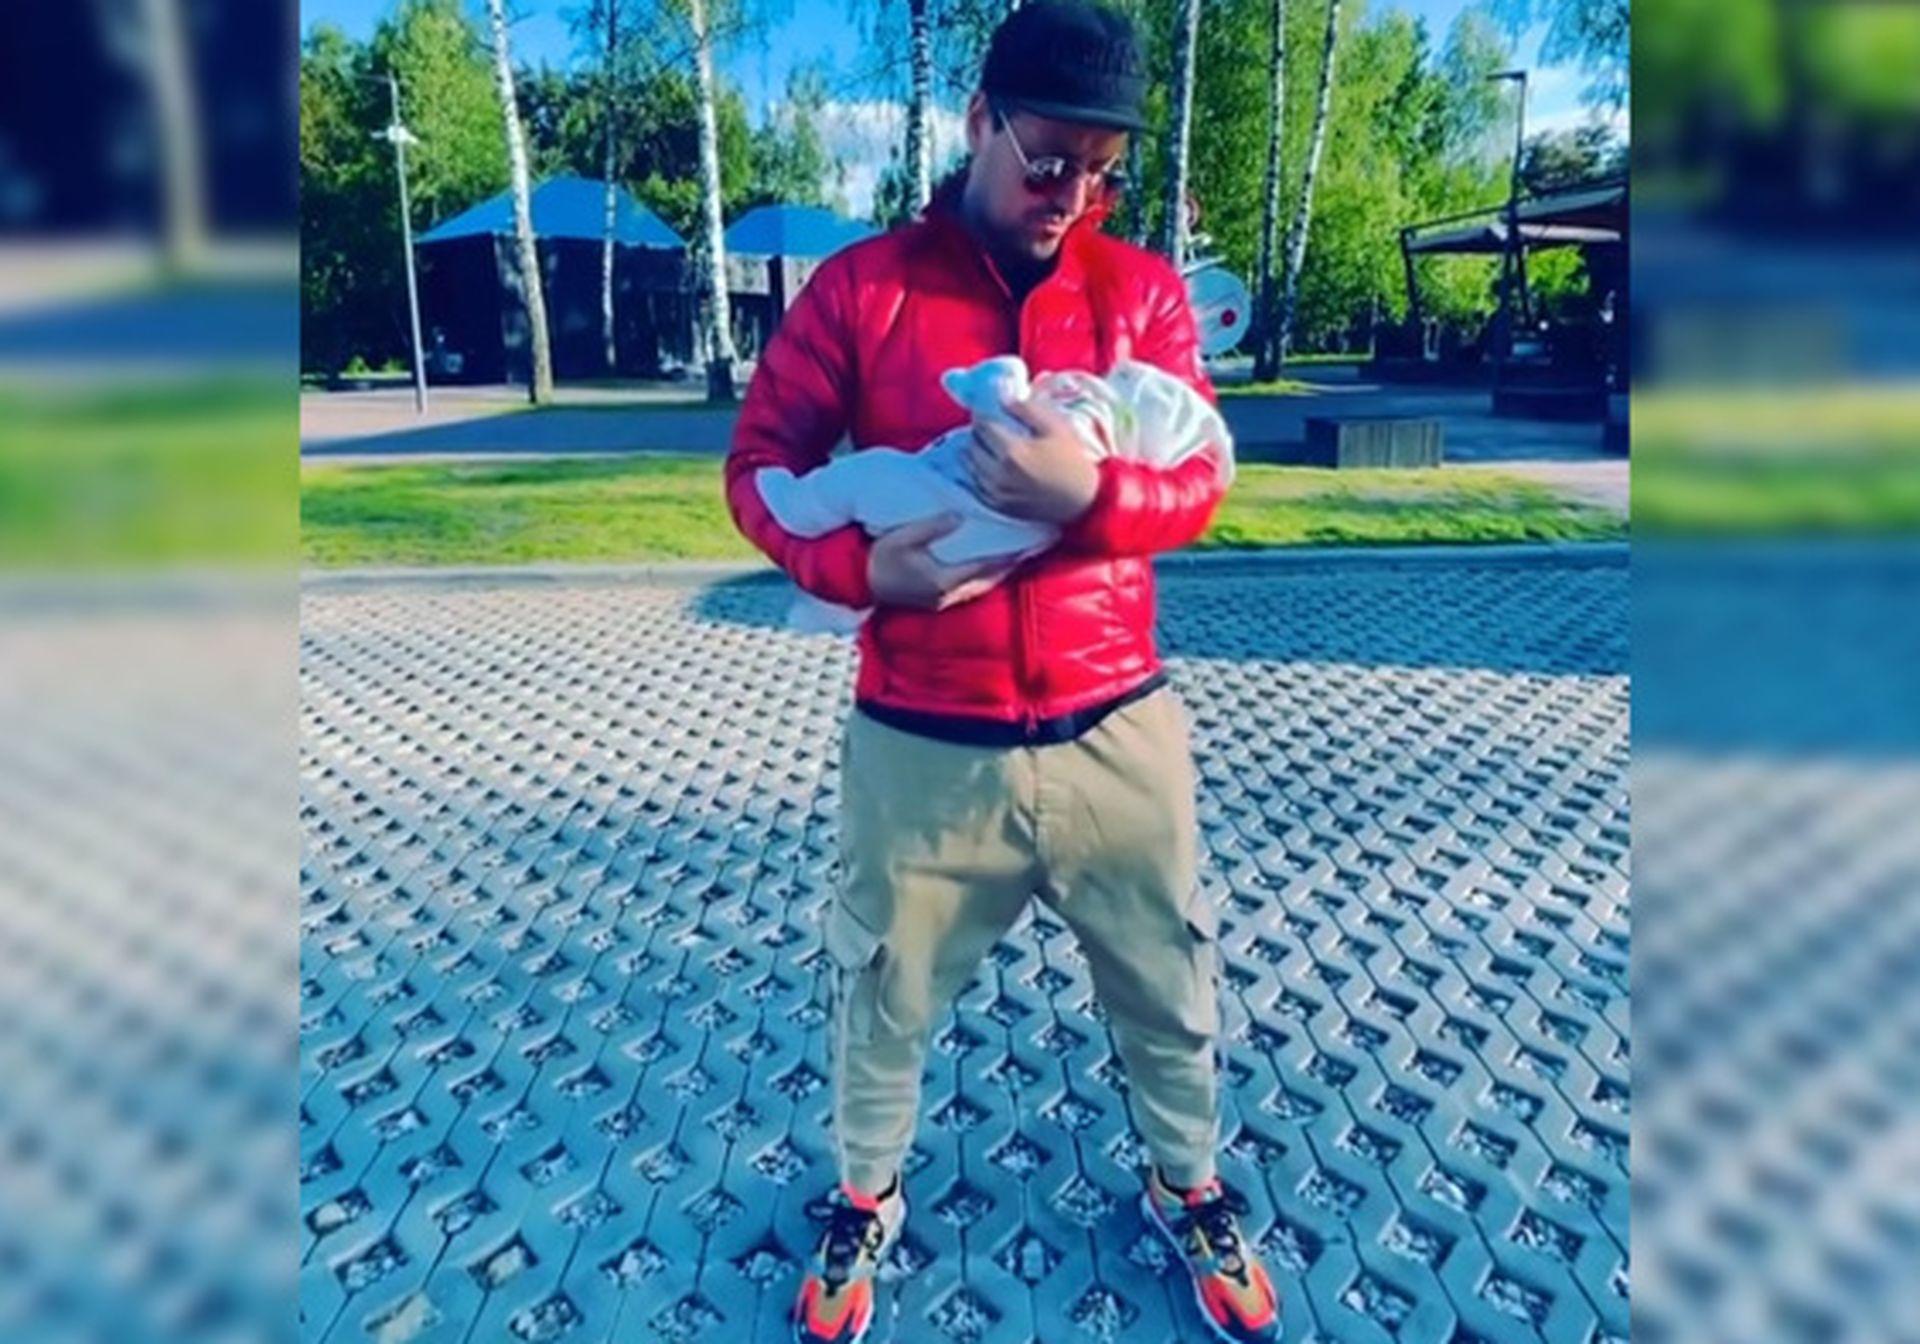 витас стал отцом в третий раз